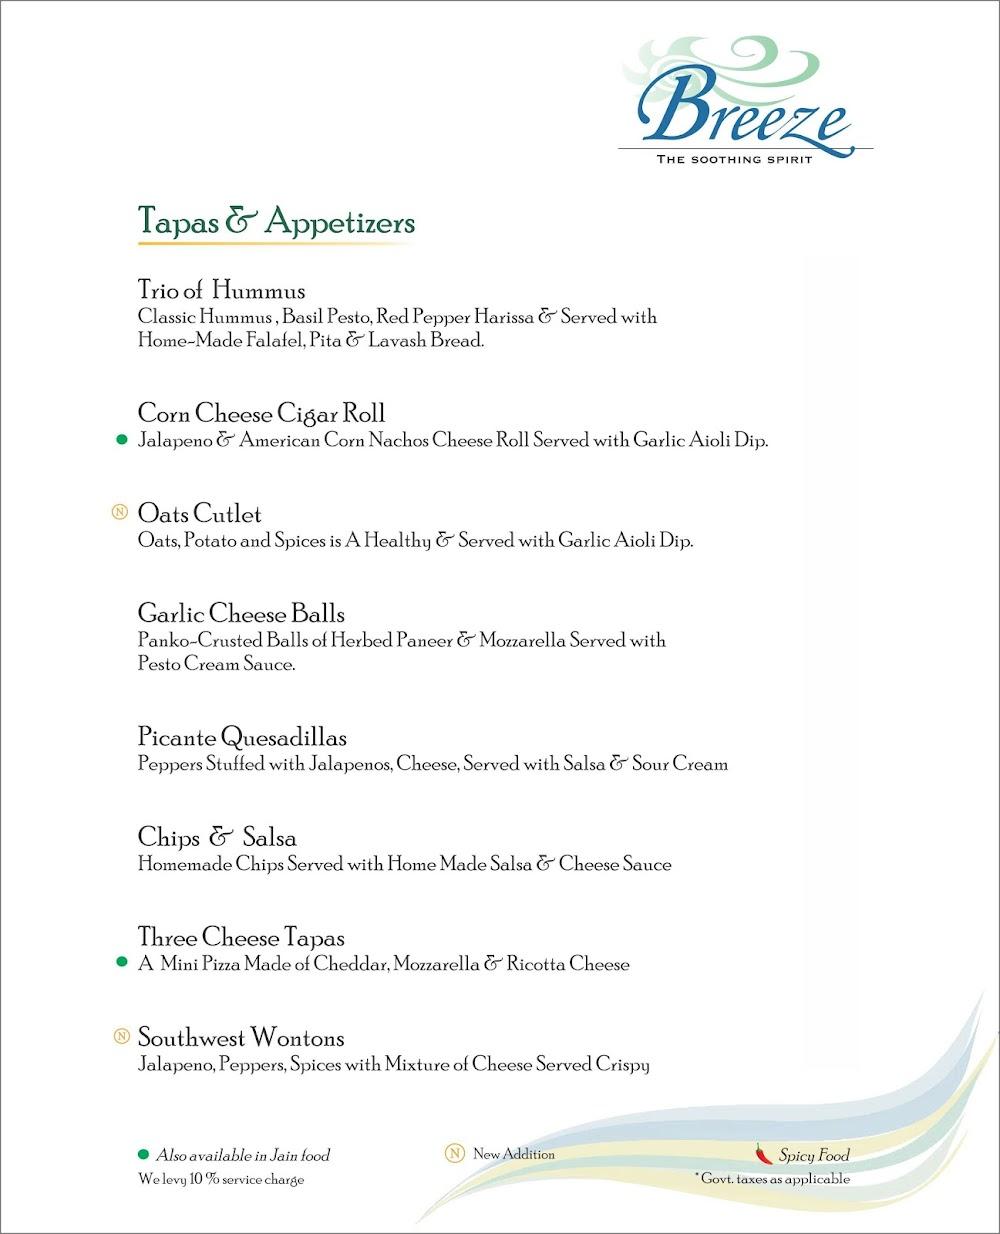 Breeze Lounge menu 7